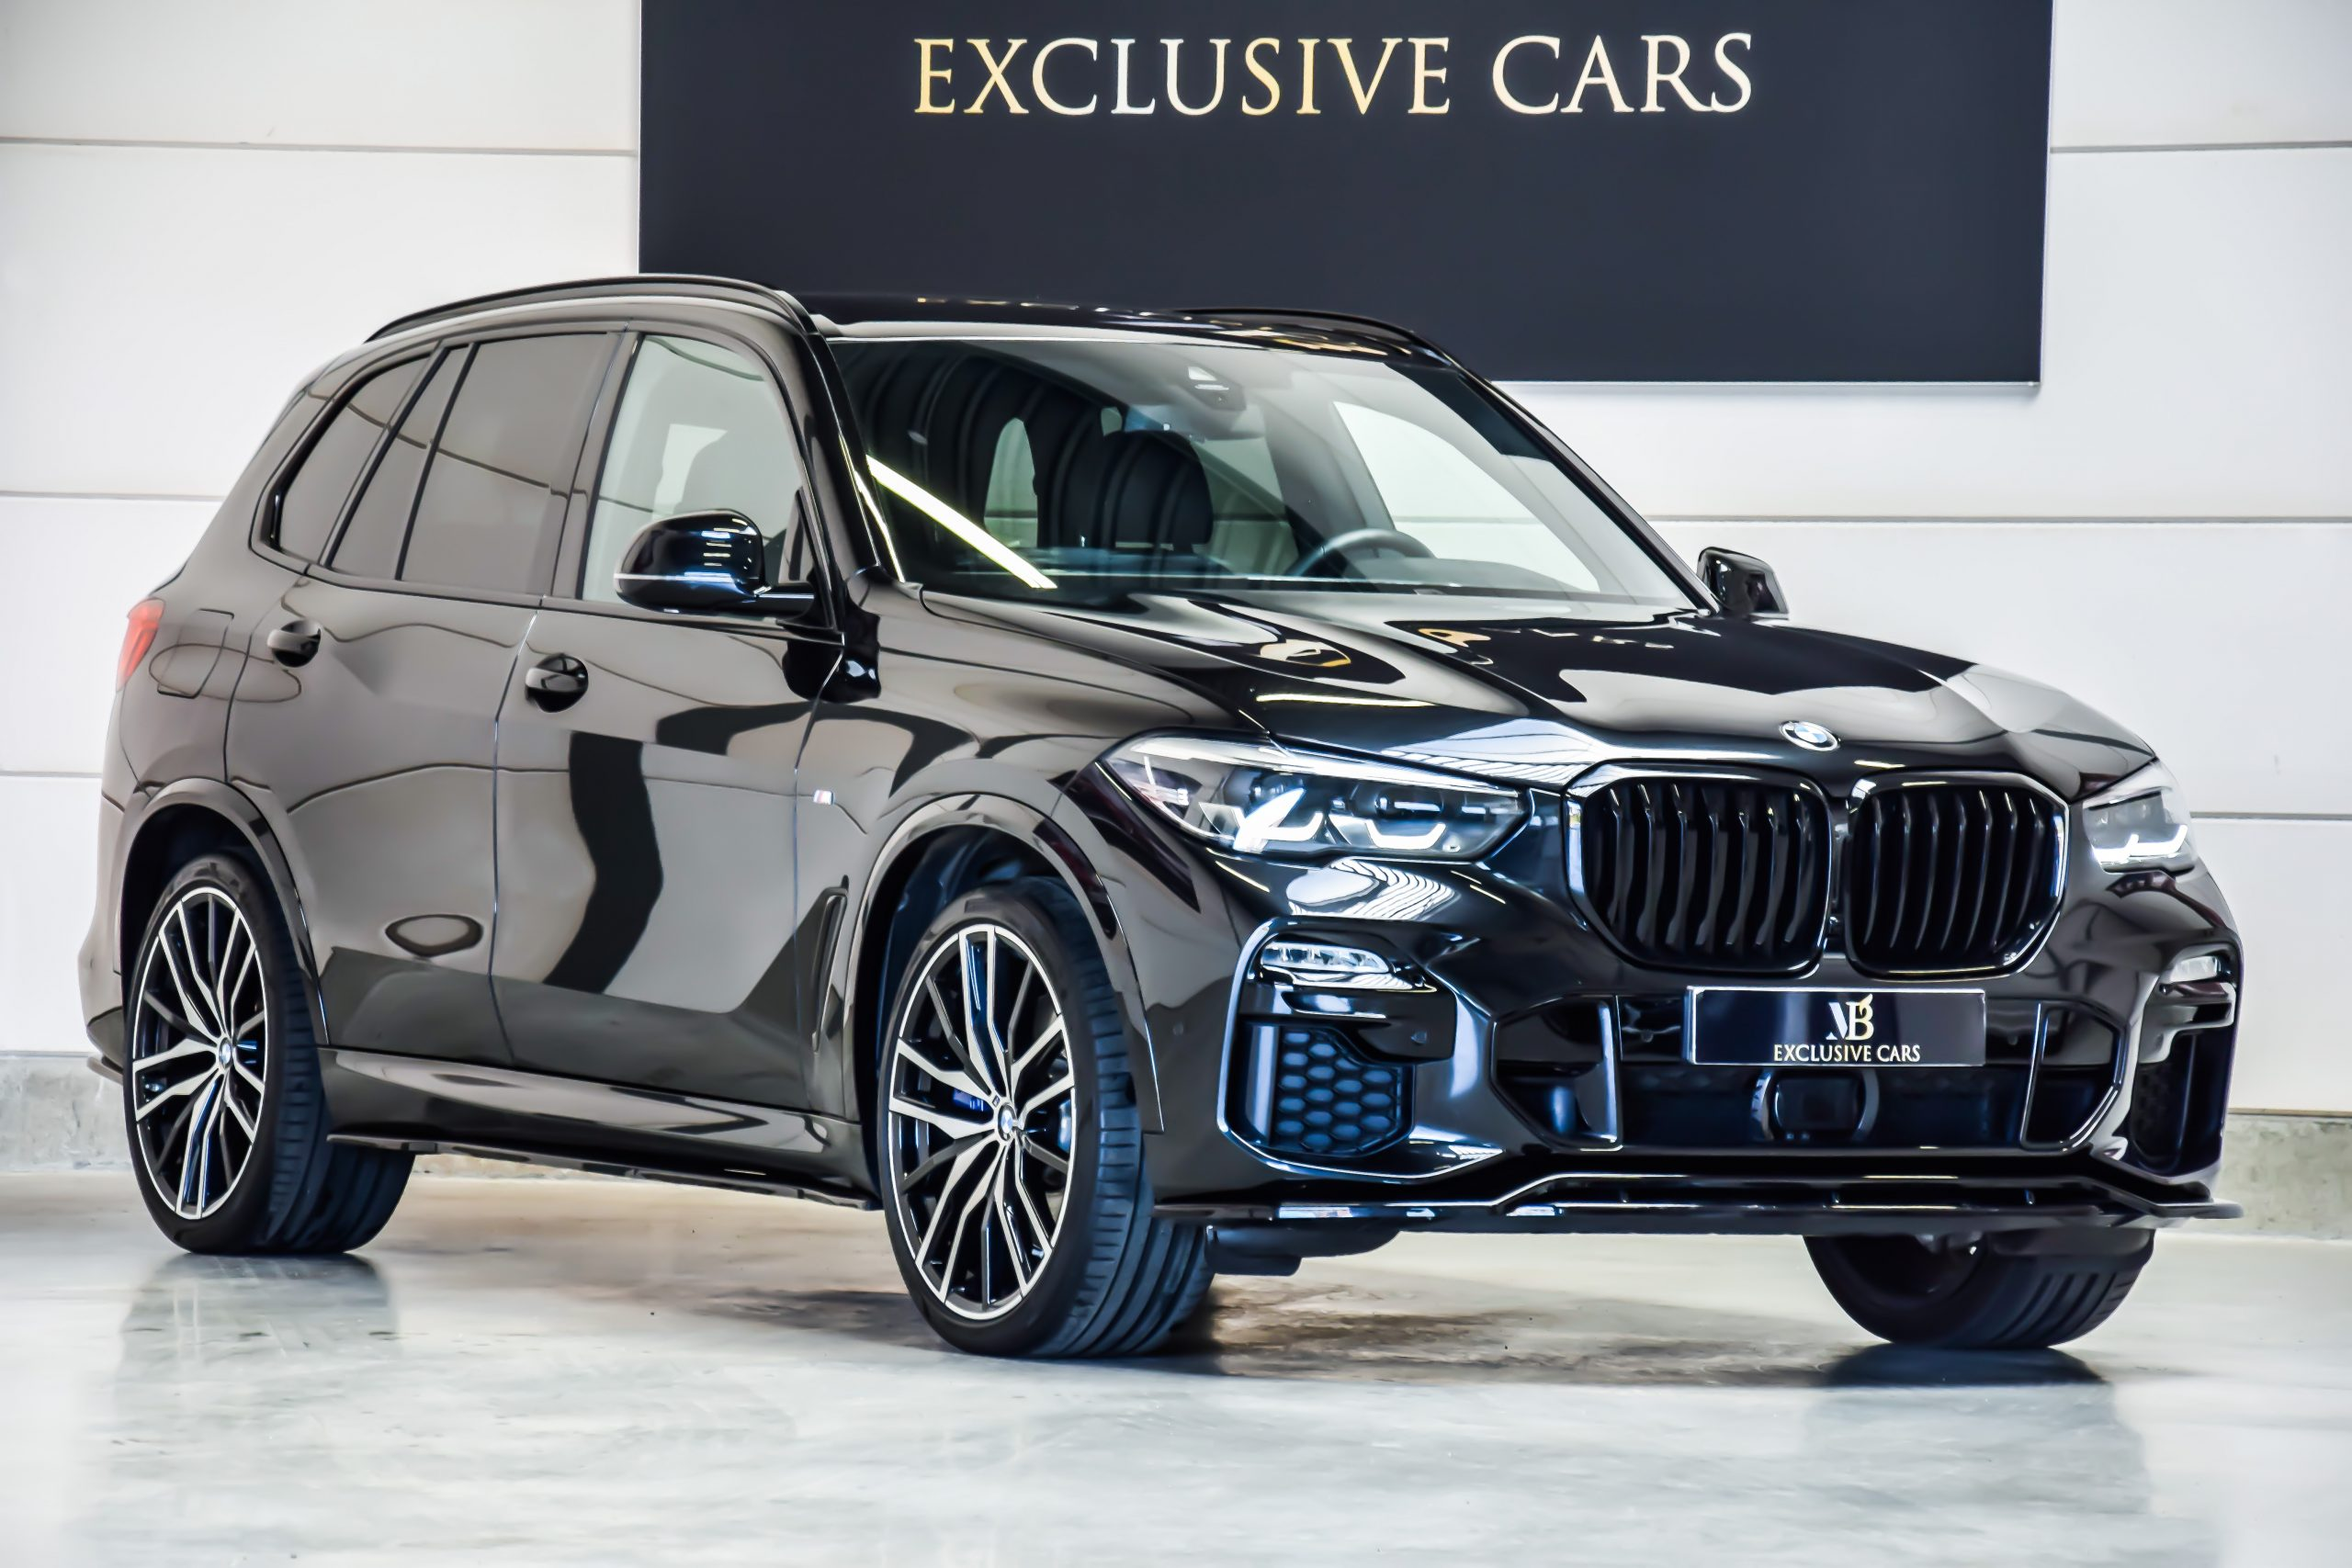 BMW X5 3.0 dAS xDrive30 AdBlue M-Sportpakket Night Edition 04/2019